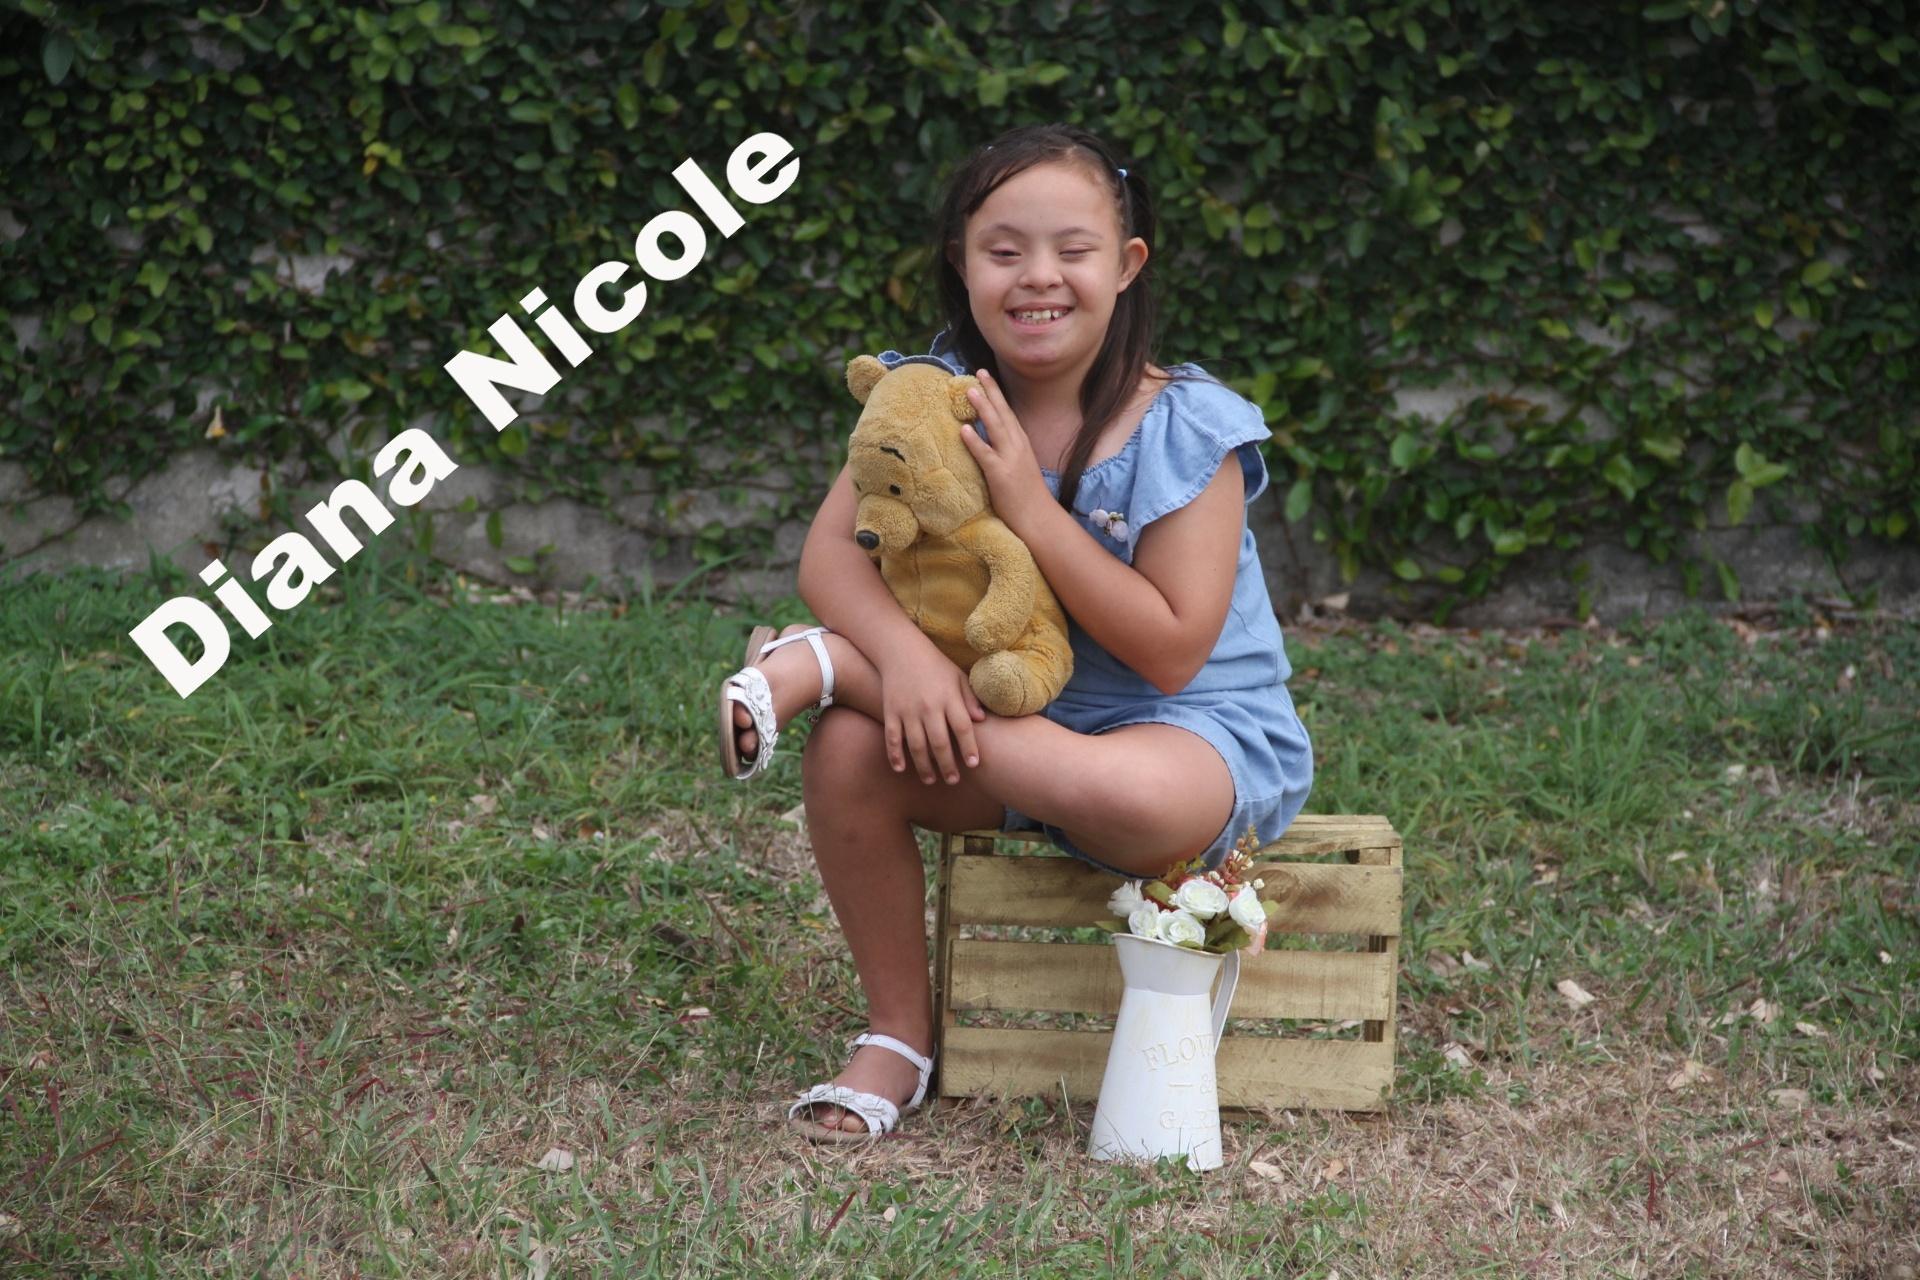 Diana Nicole